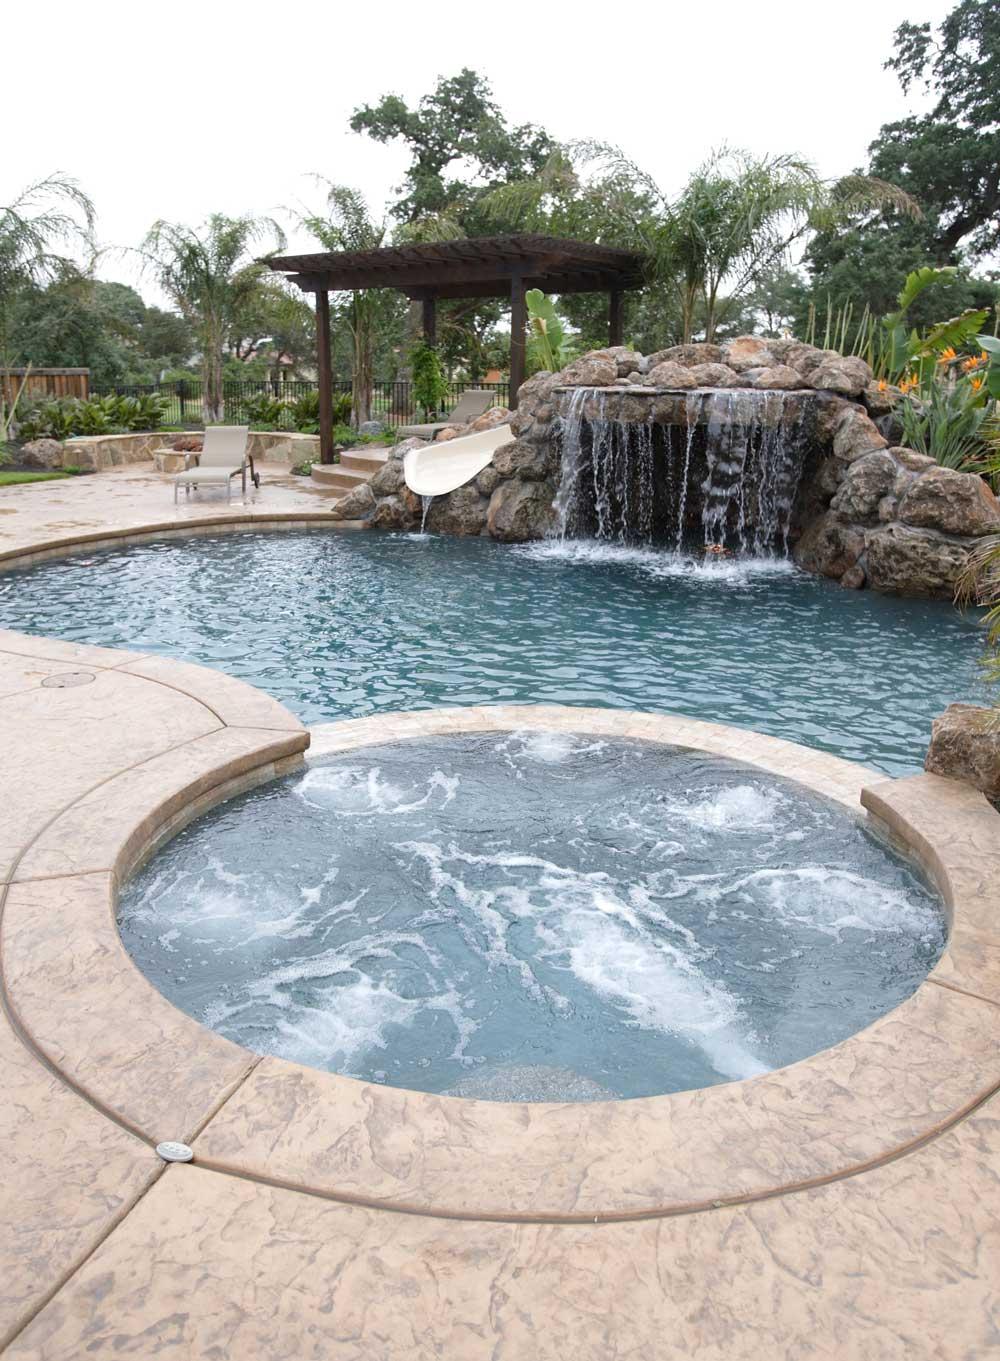 Unique Pool Designs - Hayward POOLSIDE Blog on Pool Yard Decorations id=90886